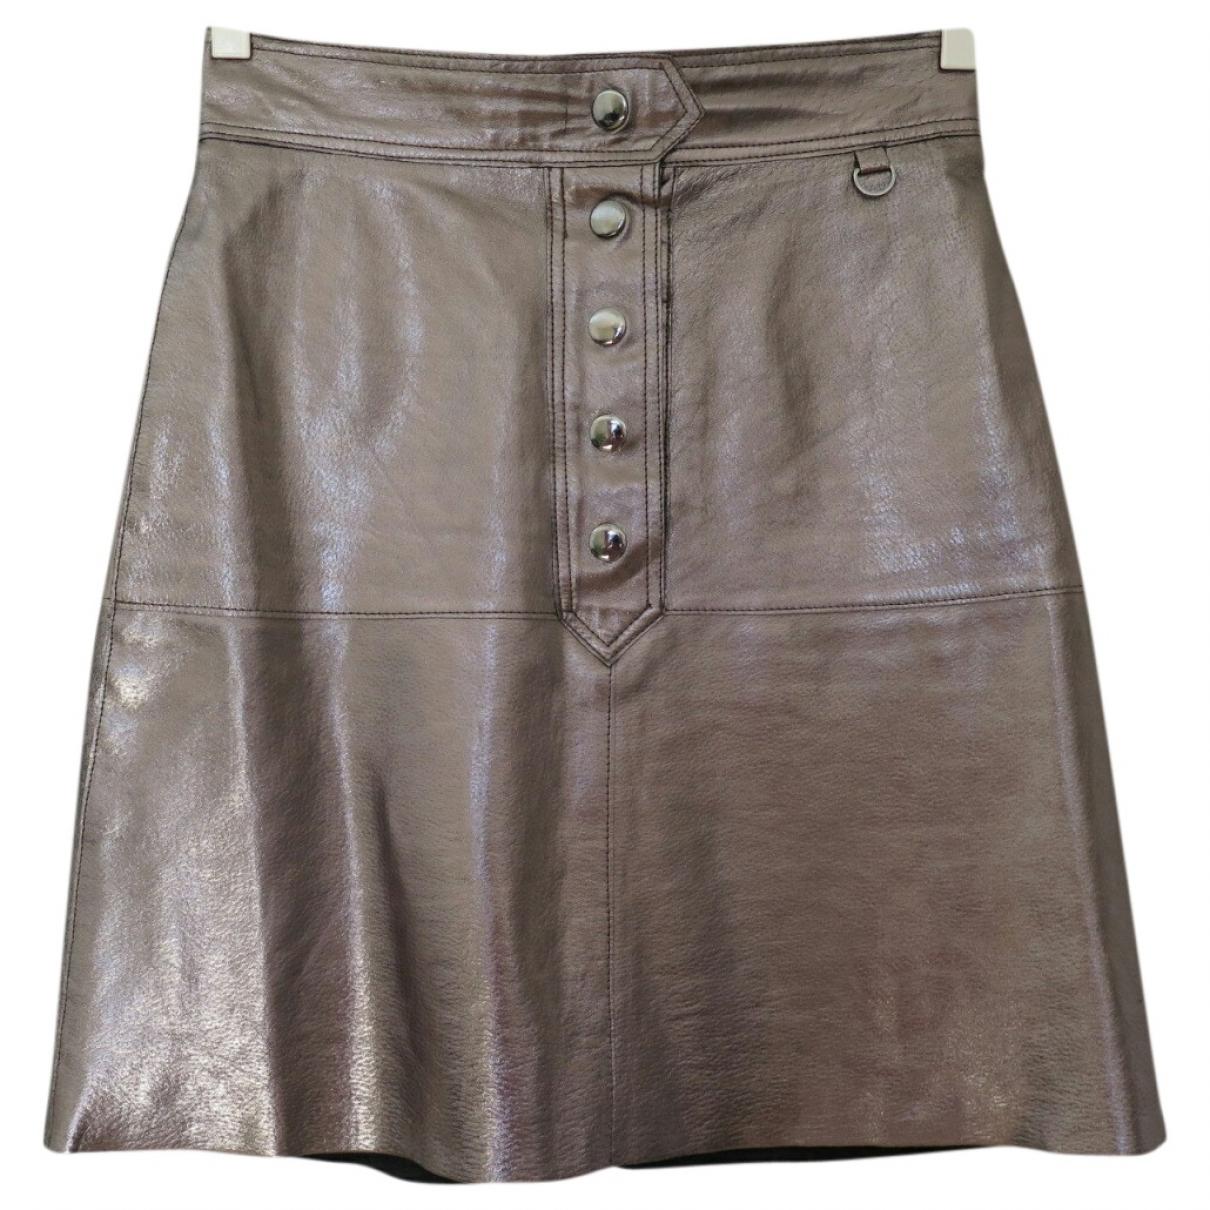 Zara \N Metallic Leather skirt for Women XS International